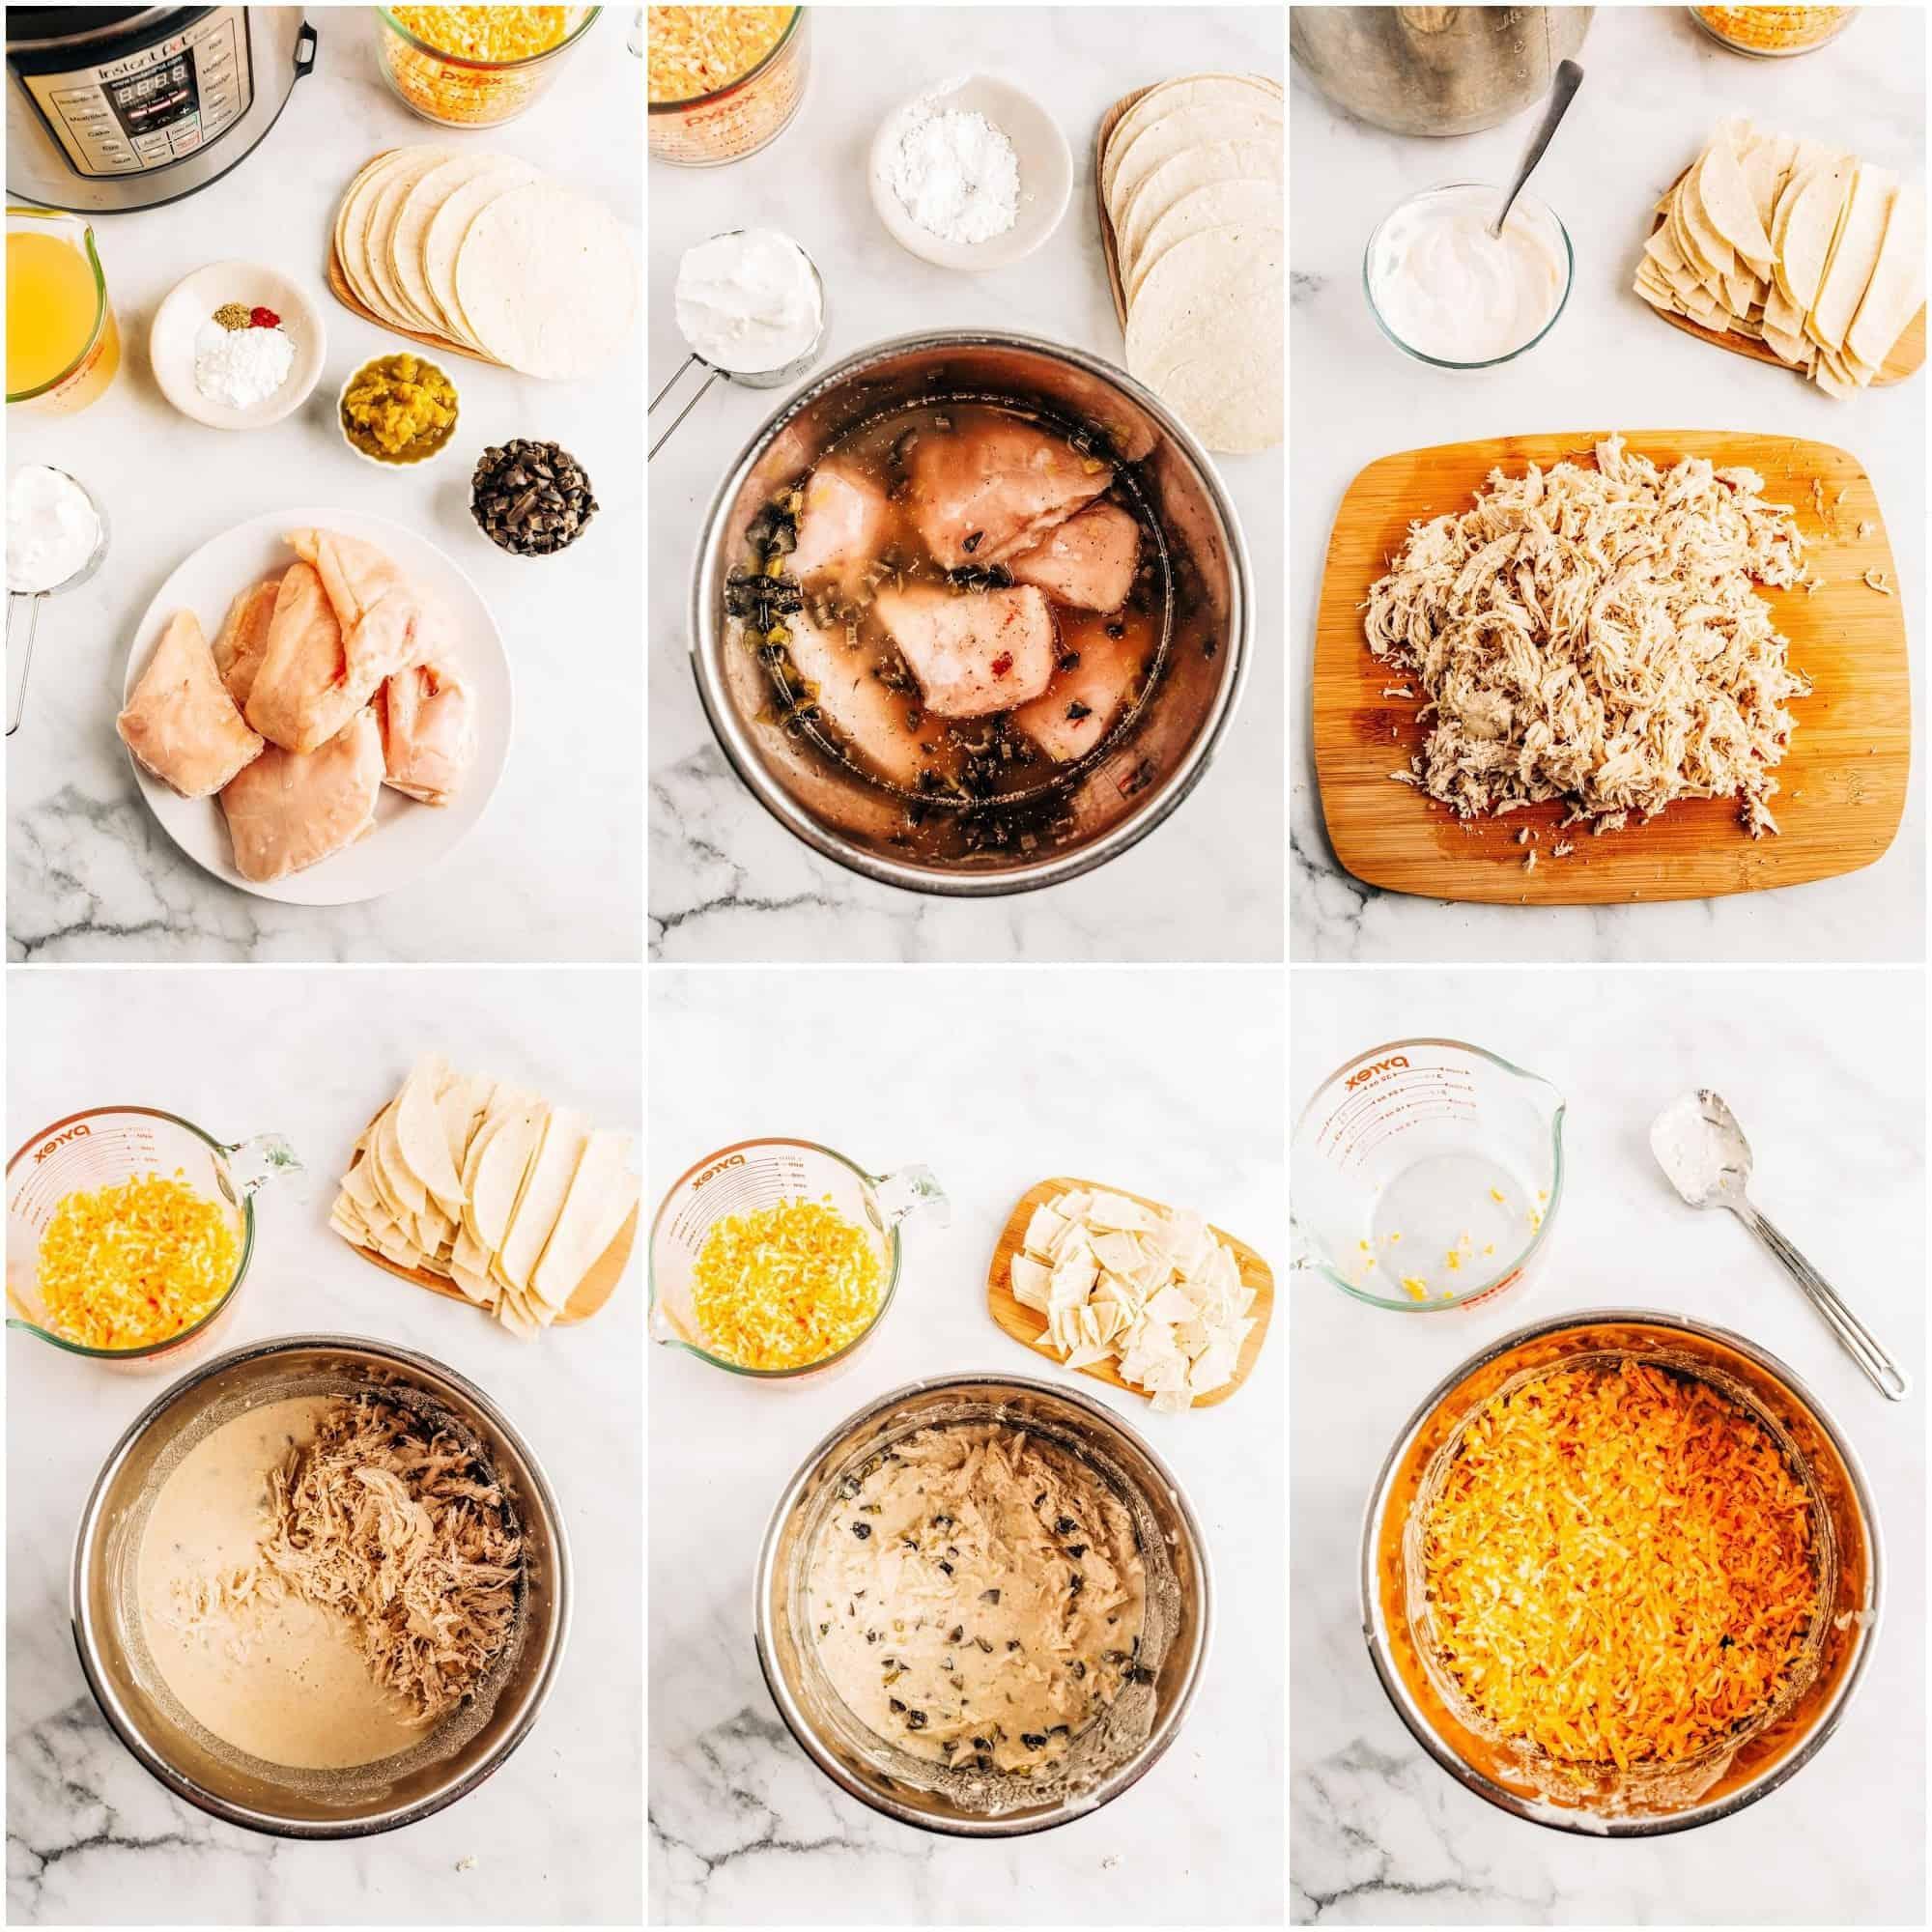 step-by-step collage of making sour cream chicken enchilada casserole